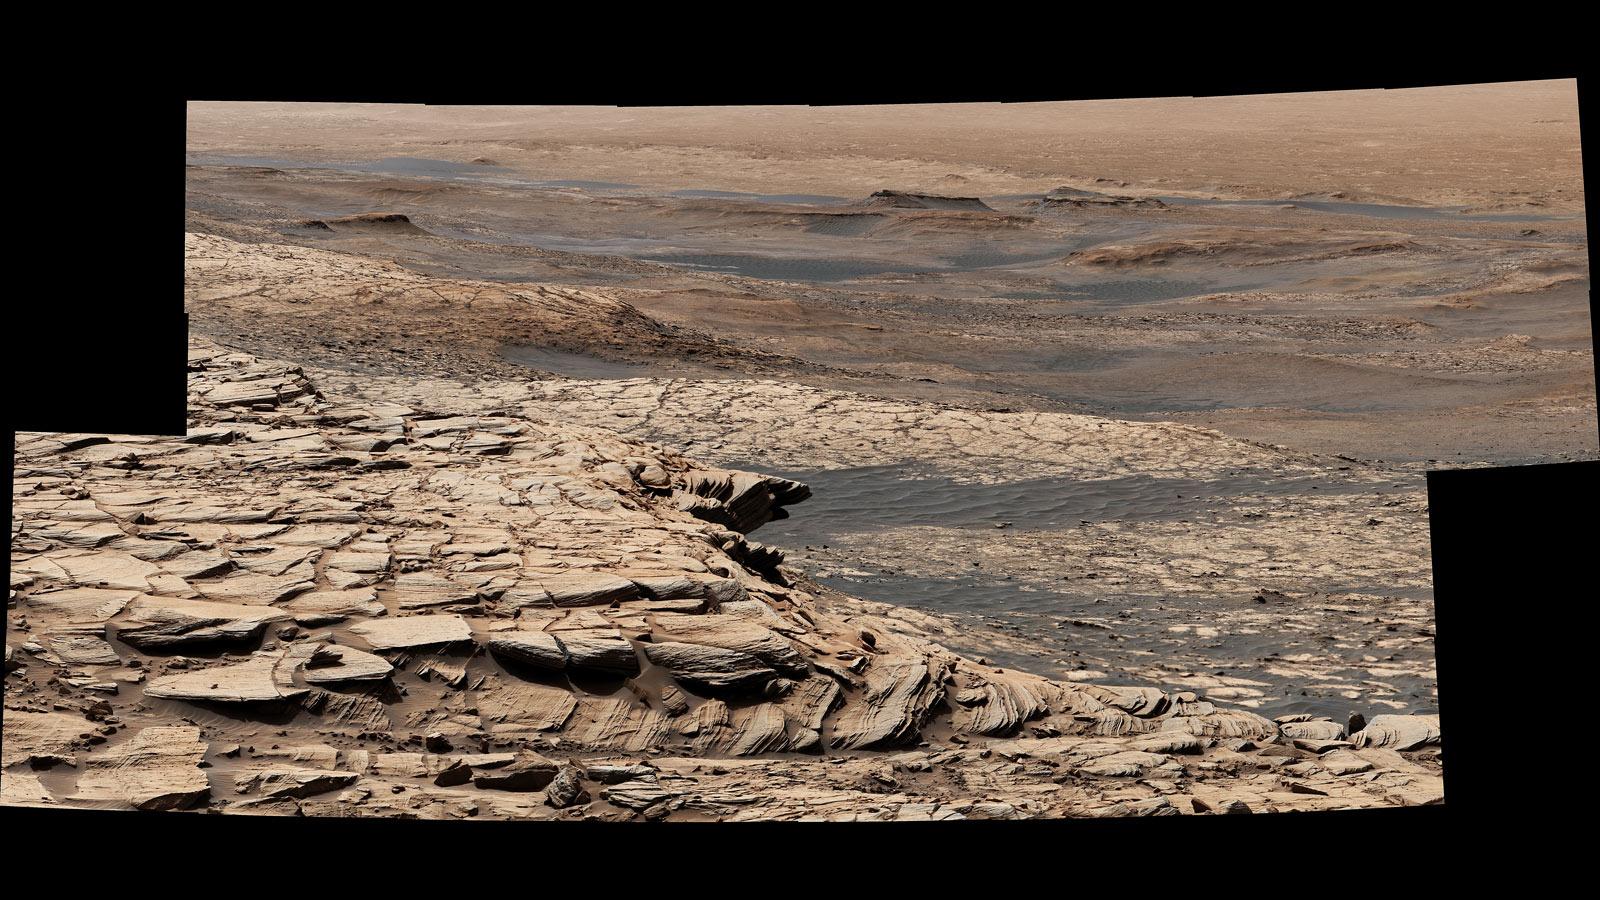 Curiosity Mars Rover's Summer Road Trip Has Begun